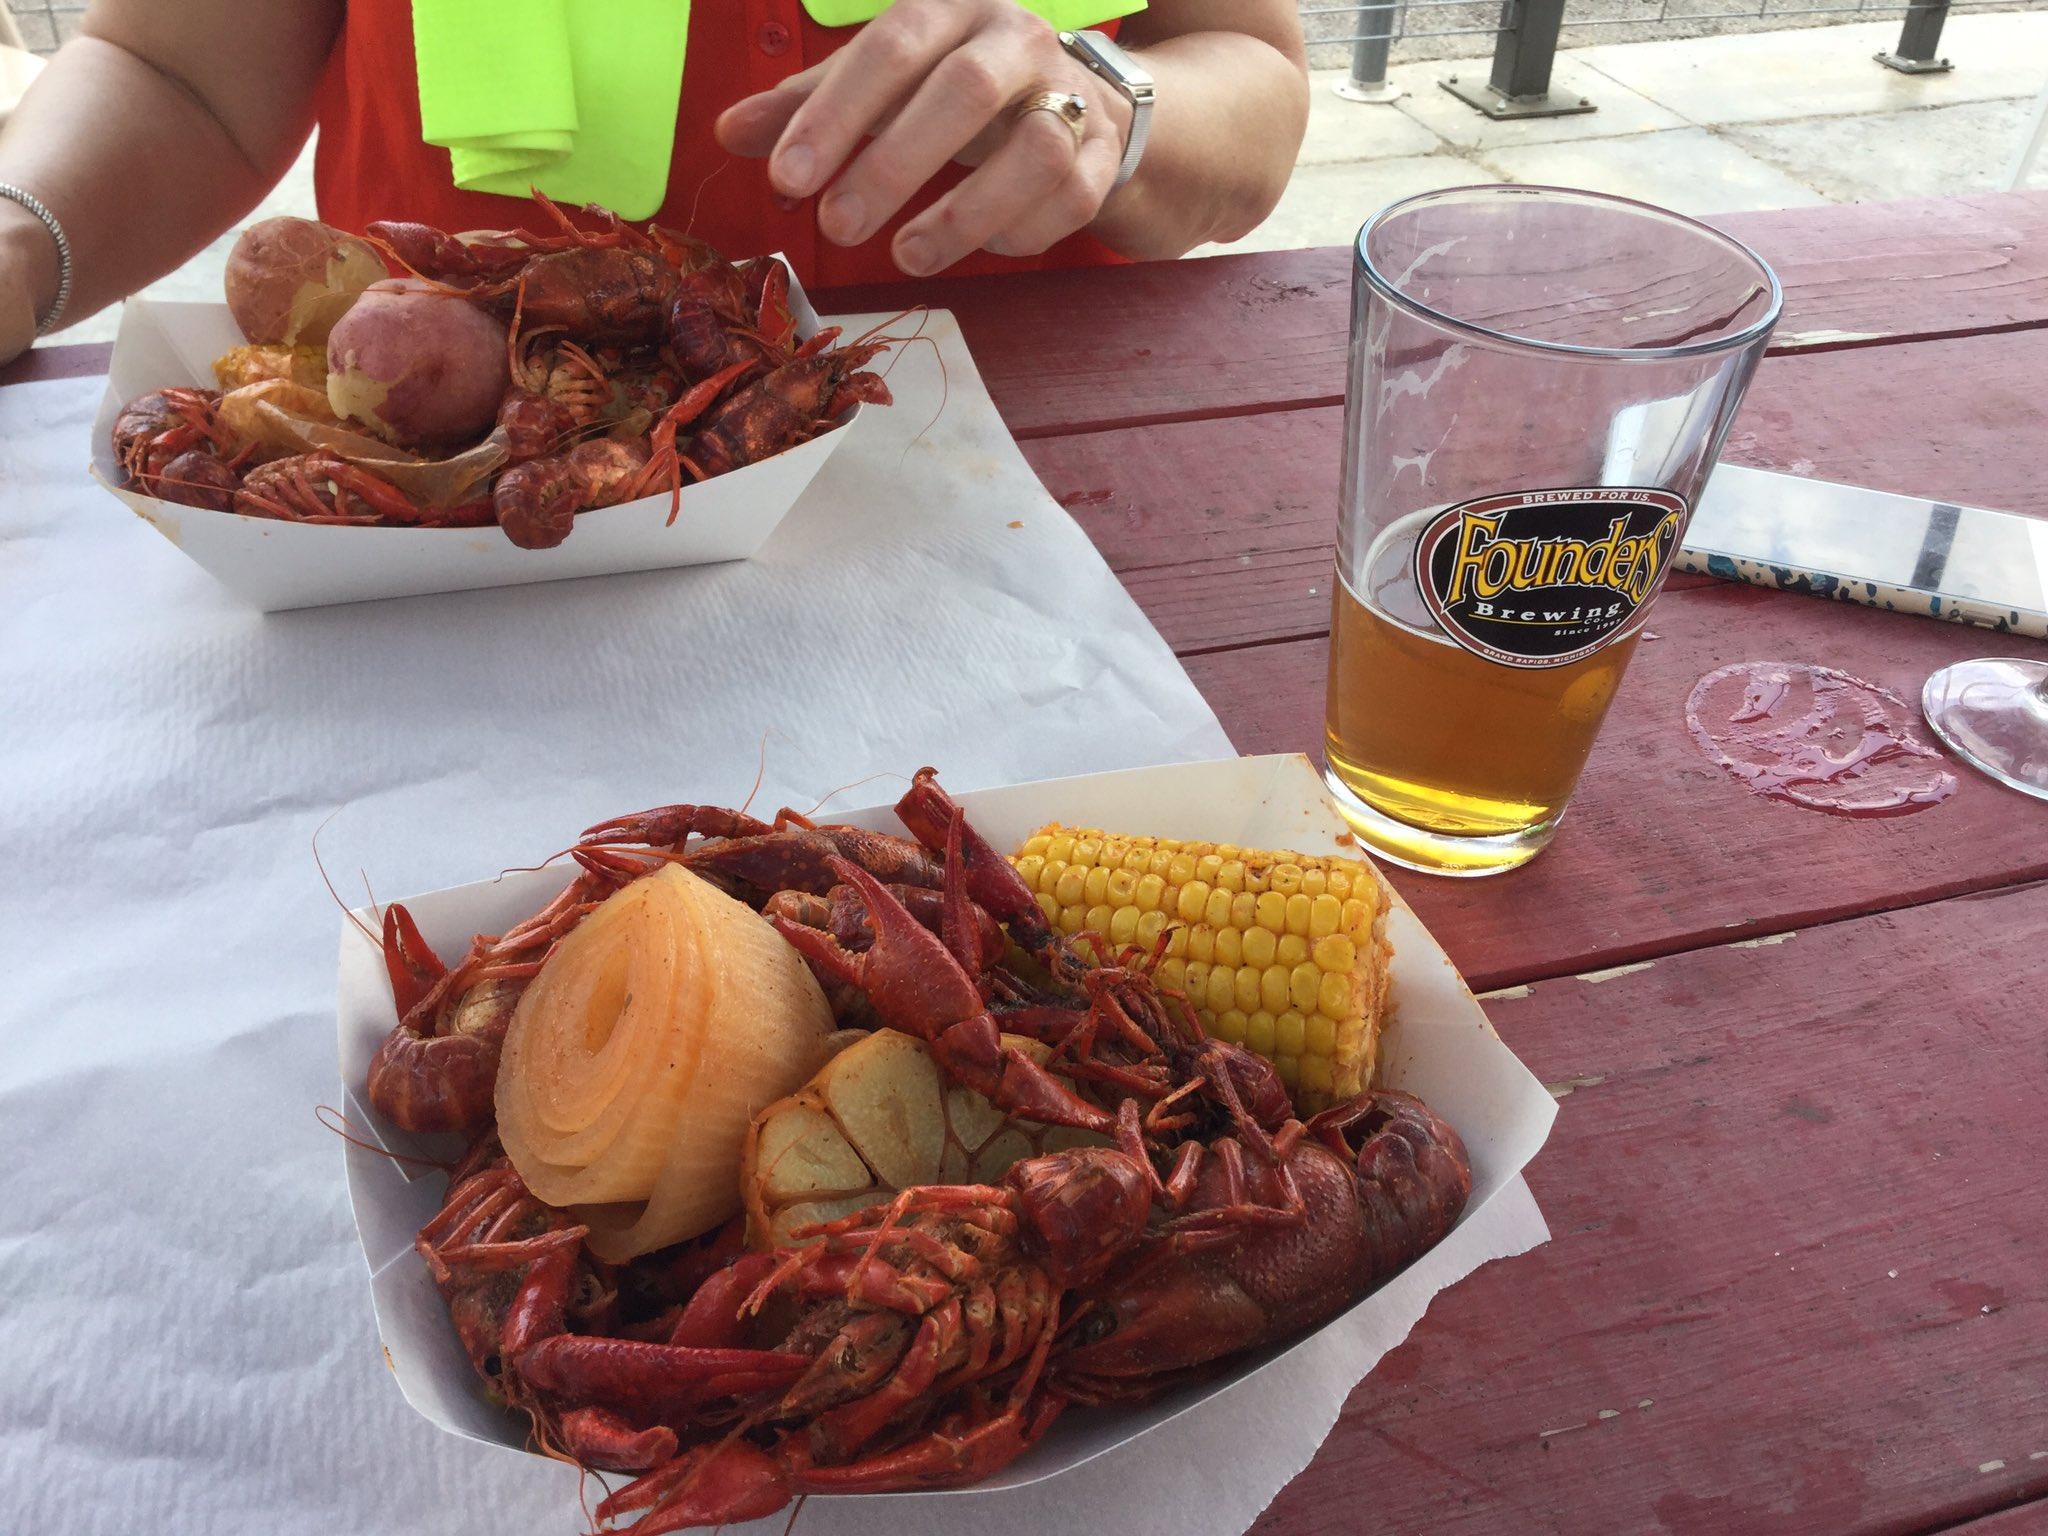 No photo of fish tacos, I'm afraid. How about a crawfish boil?  #PresbyIntersect https://t.co/0DImBLo1DU